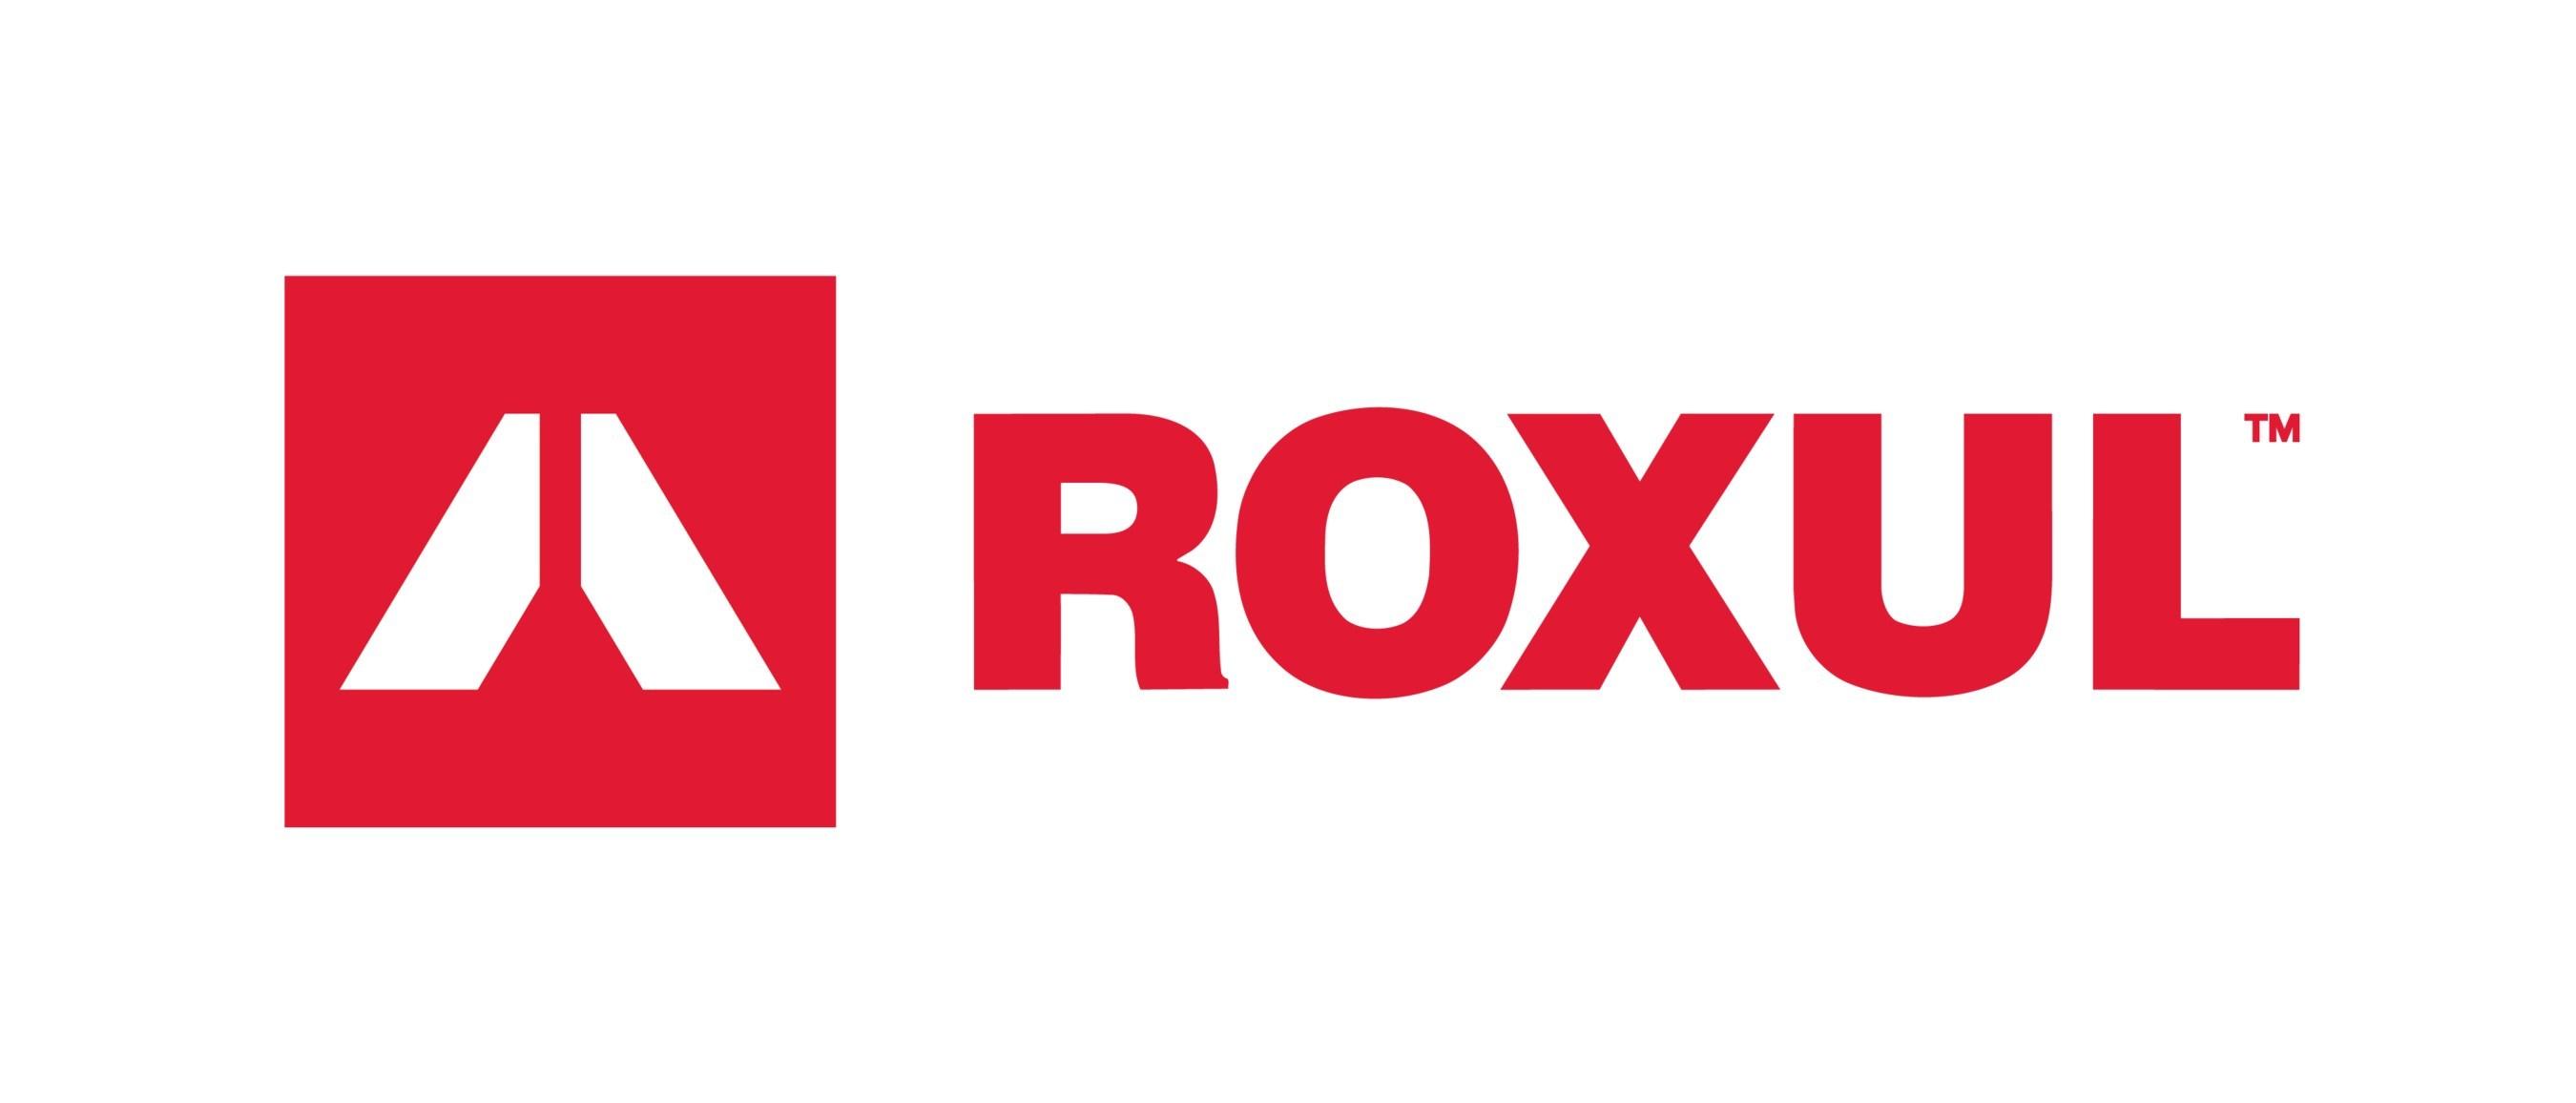 b3f3dad2fa64 Roxul Inc  ROXUL  Inc  helps make affordable  sustainable housin.jpg p publish